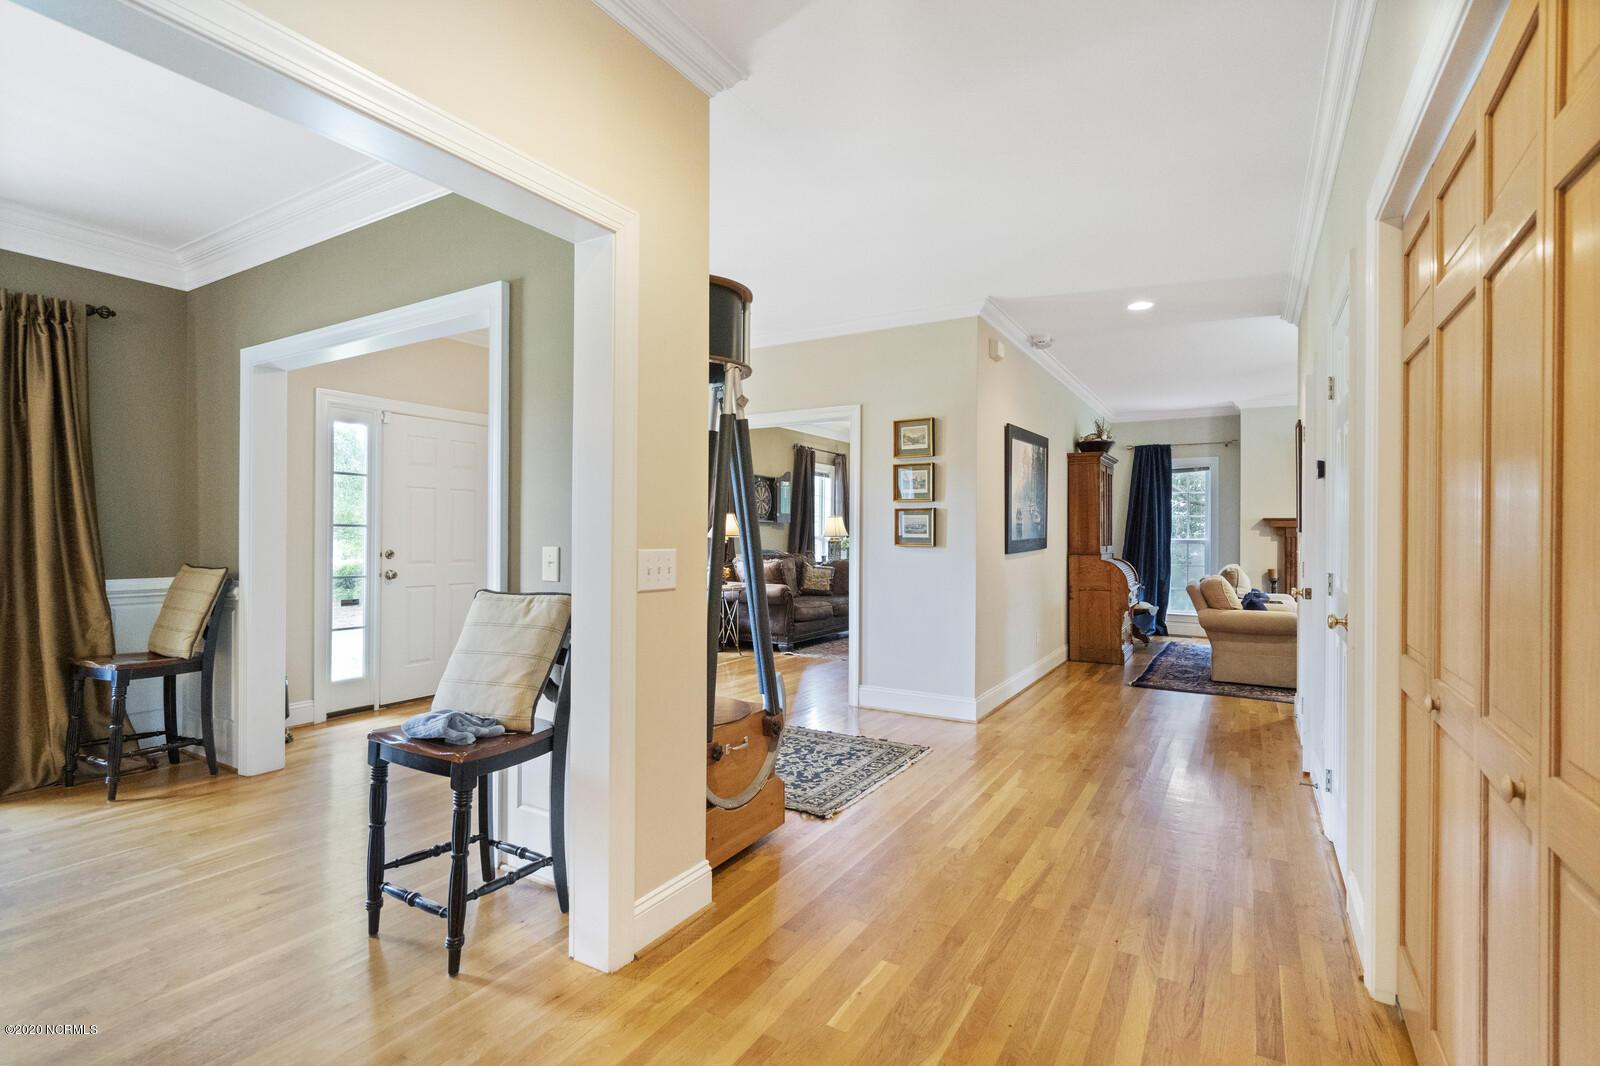 2205 Tattersalls Drive, Wilmington, North Carolina 28403, 3 Bedrooms Bedrooms, 11 Rooms Rooms,2 BathroomsBathrooms,Single family residence,For sale,Tattersalls,100231595